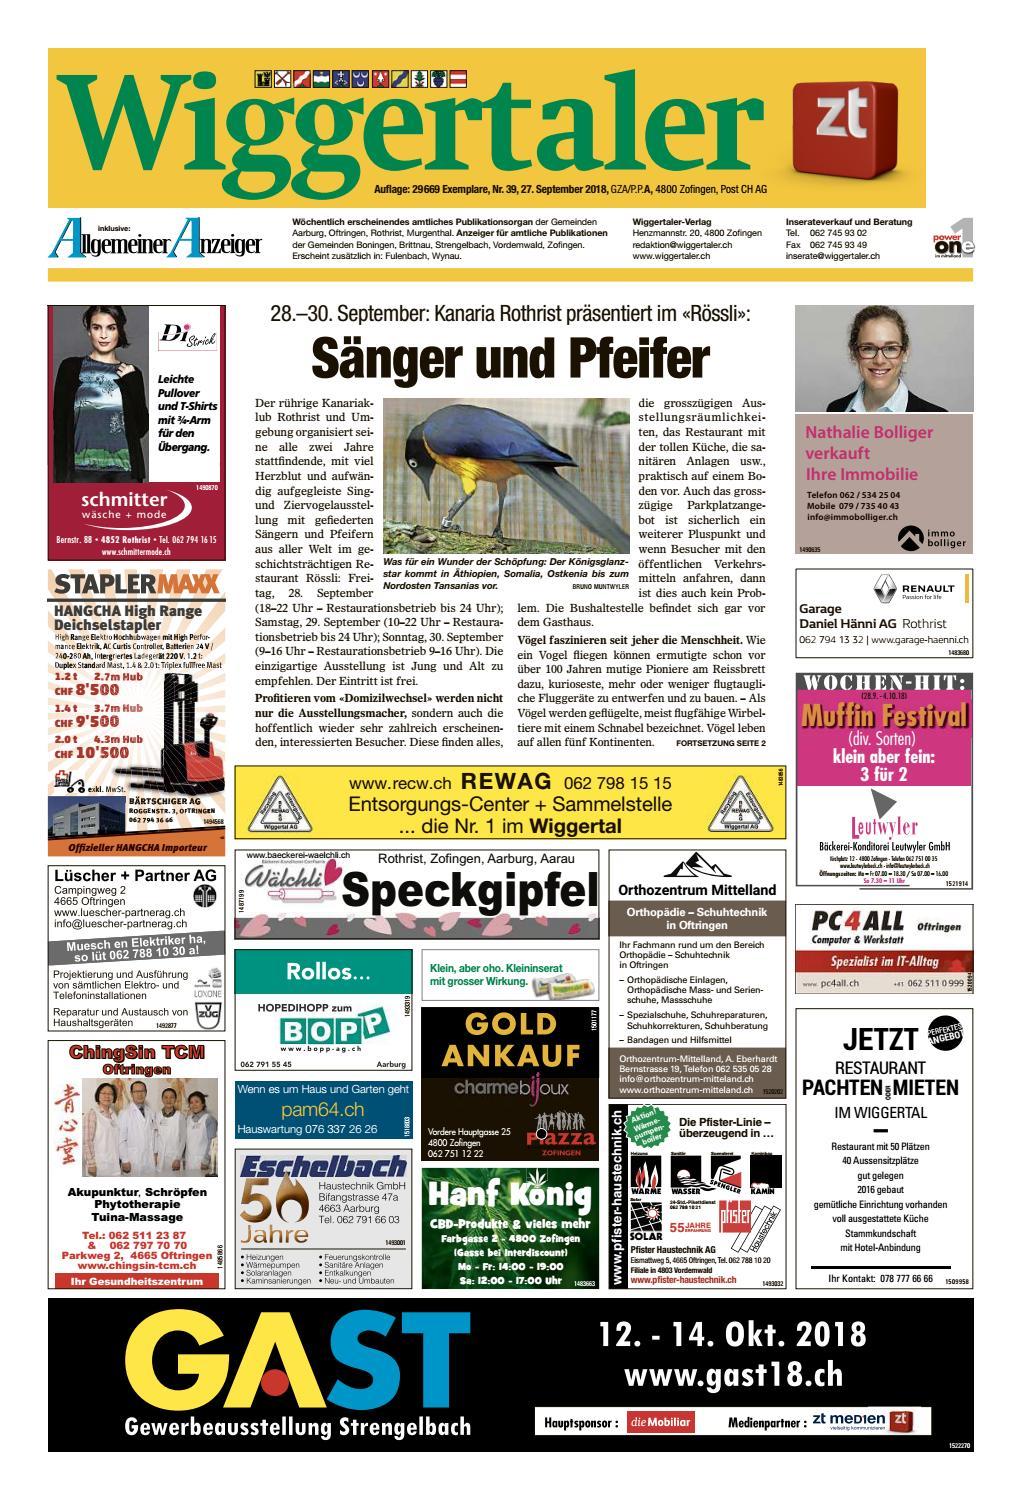 Wiggertaler 3918 By Zt Medien Ag Issuu